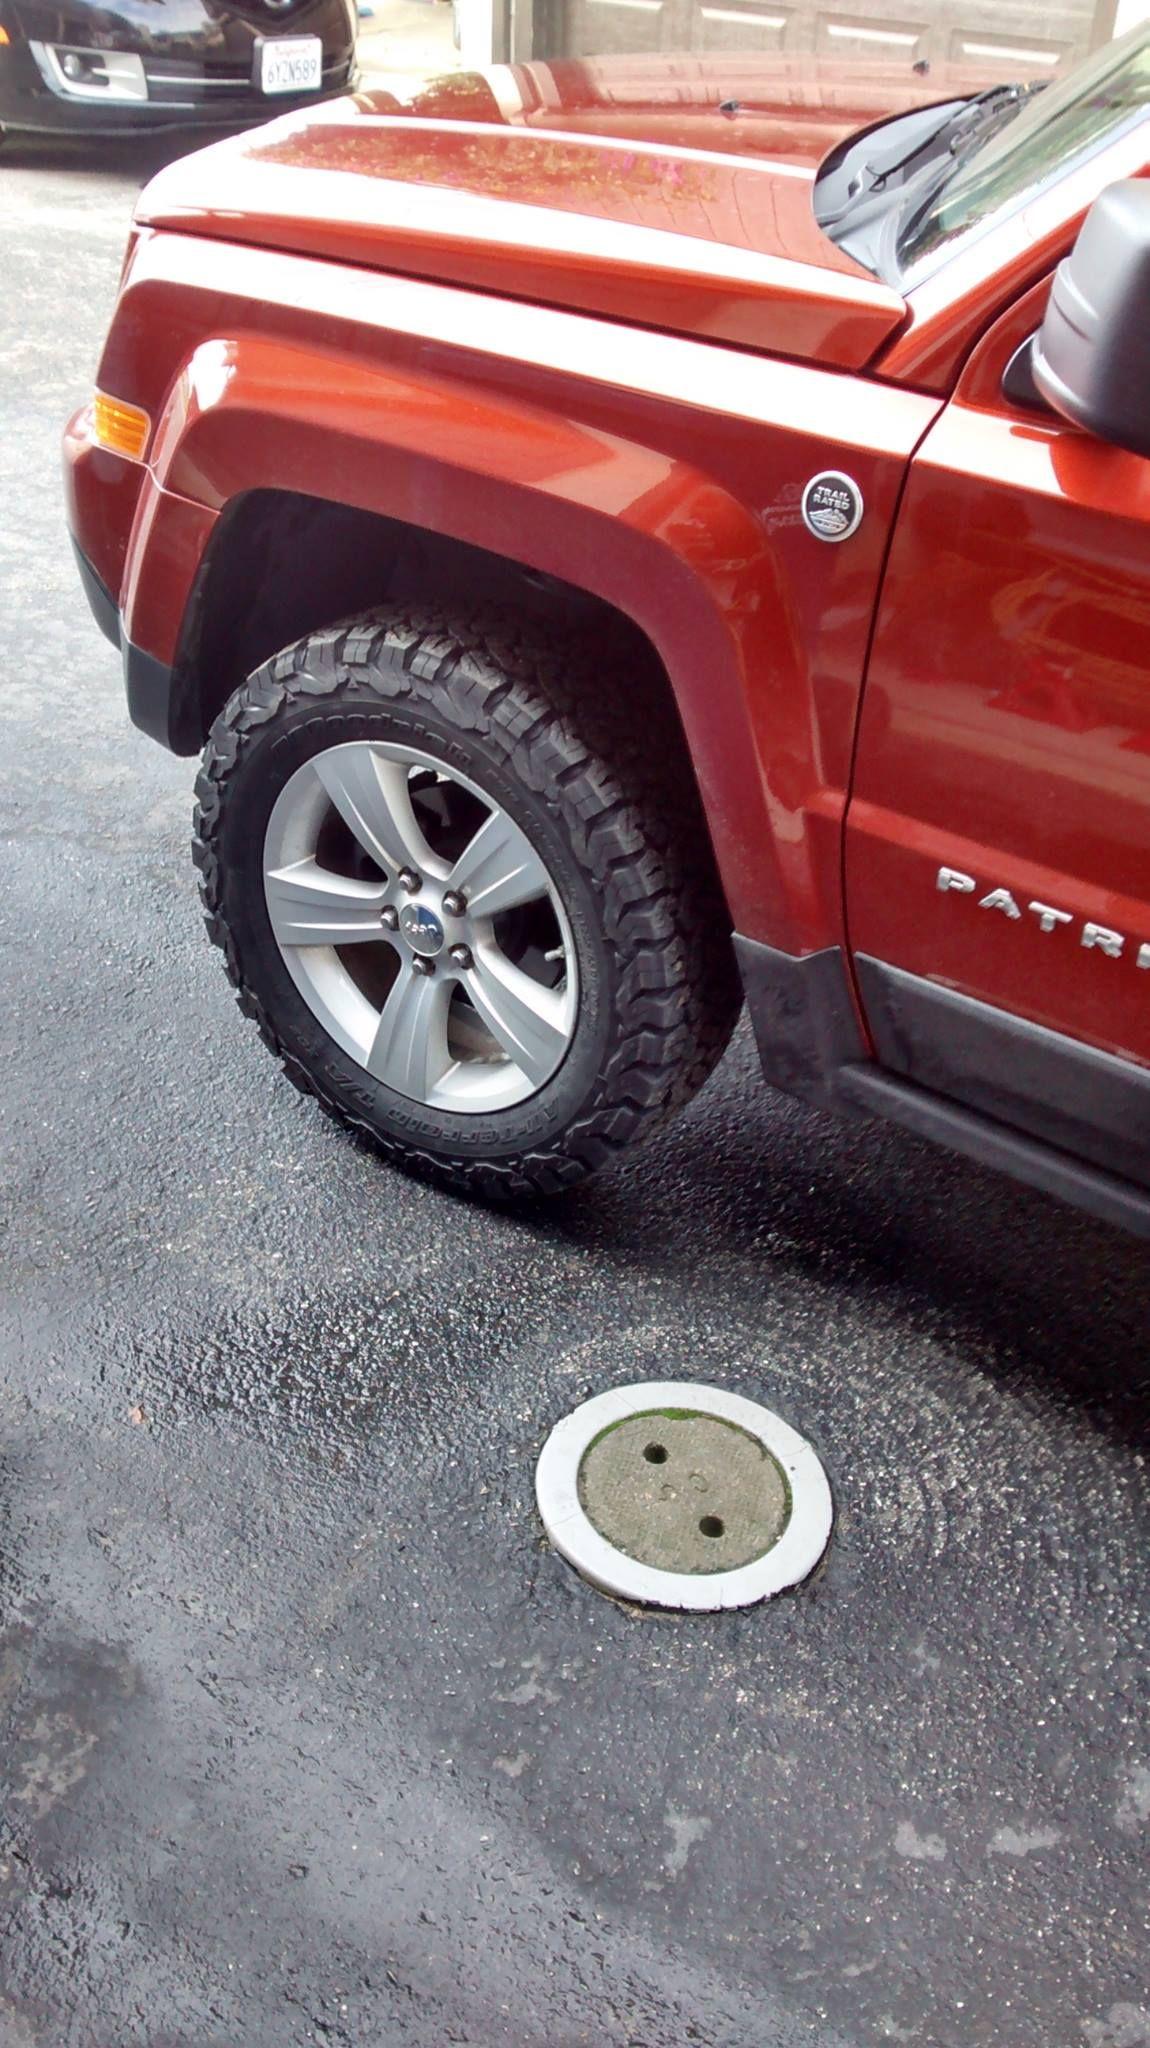 jeep patriot rro lift spacers 225 65r17 bfgoodrich all terrain t a ko2 tires jeep. Black Bedroom Furniture Sets. Home Design Ideas